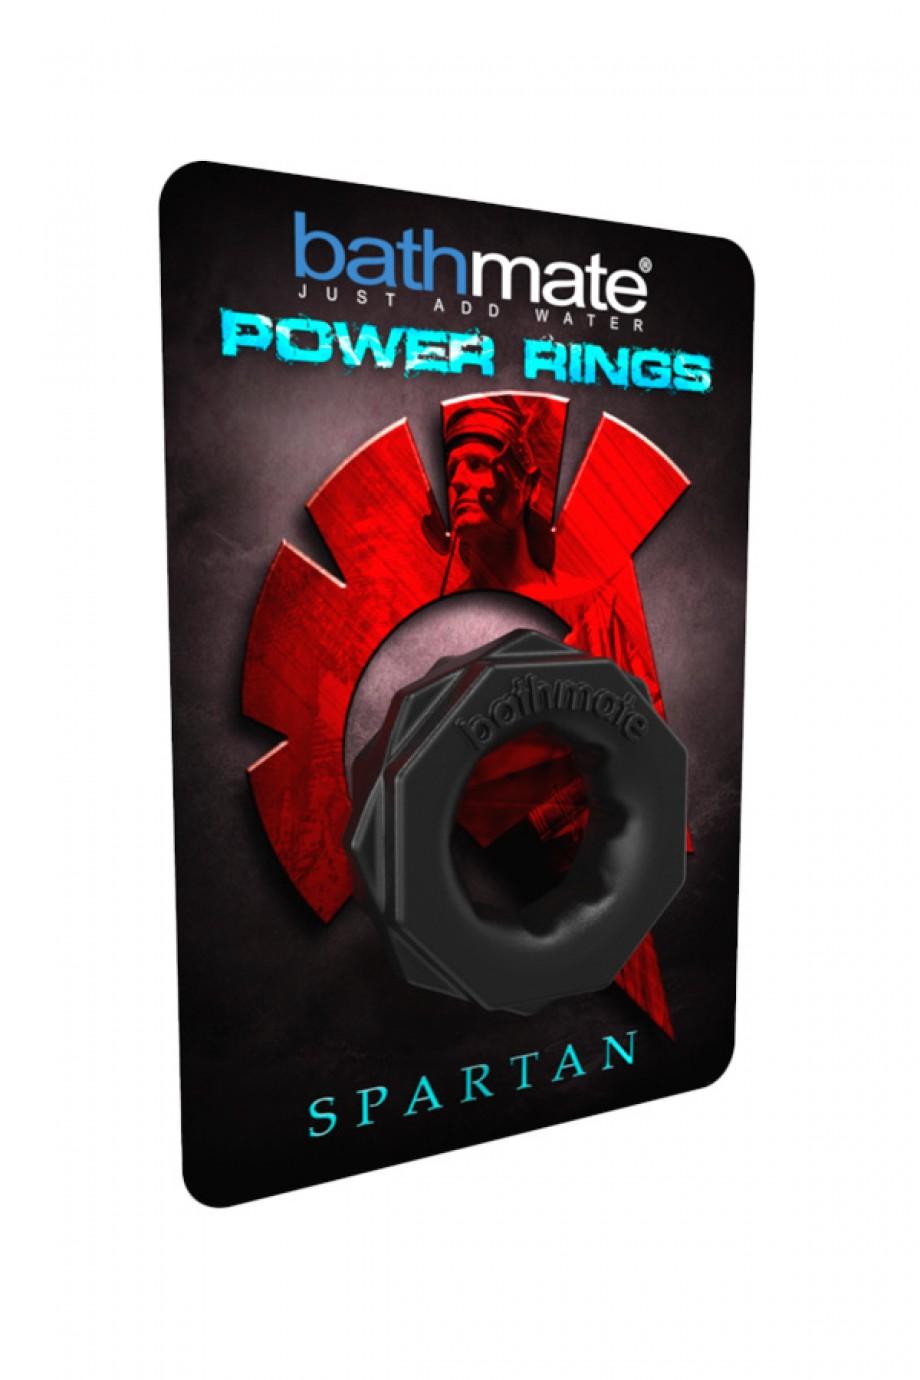 Bathmate Spartan